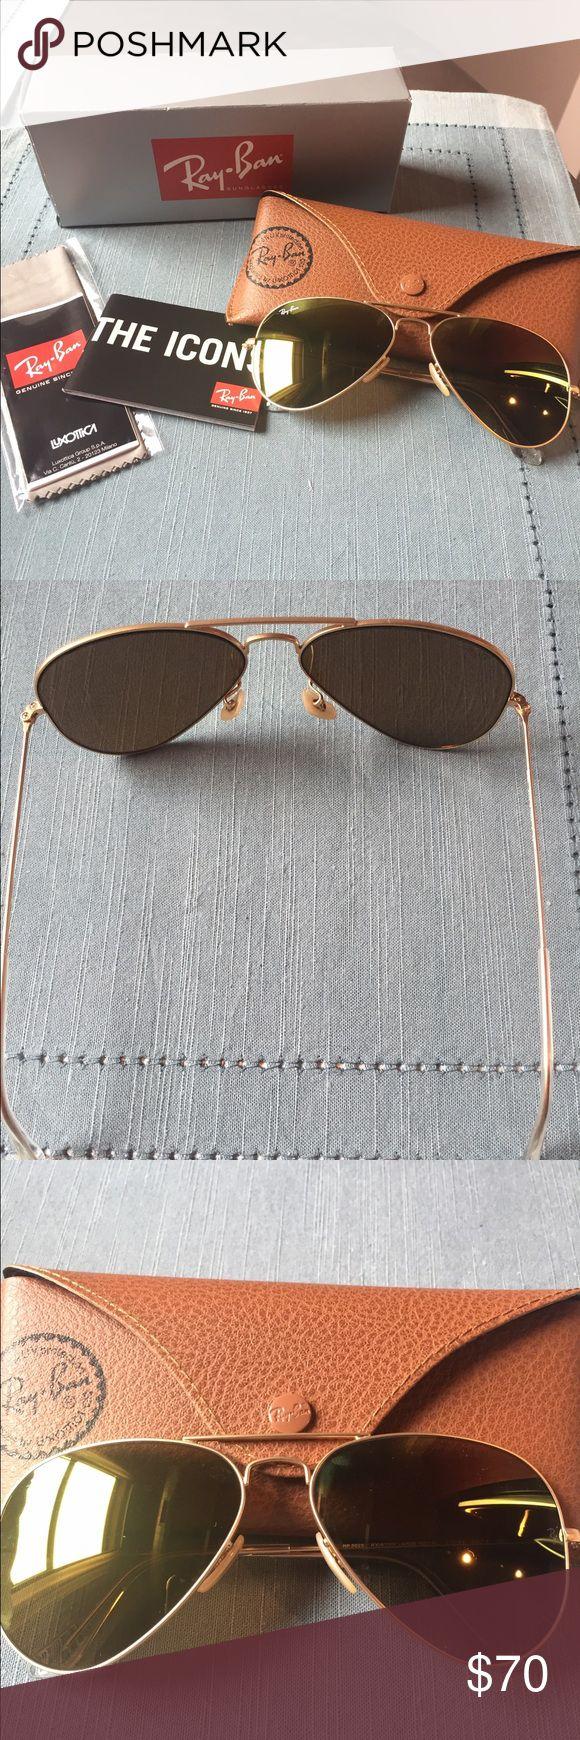 Ray Ban Women's aviator sunglasses Brand new never worn Ray Ban aviators in gold Ray-Ban Accessories Sunglasses